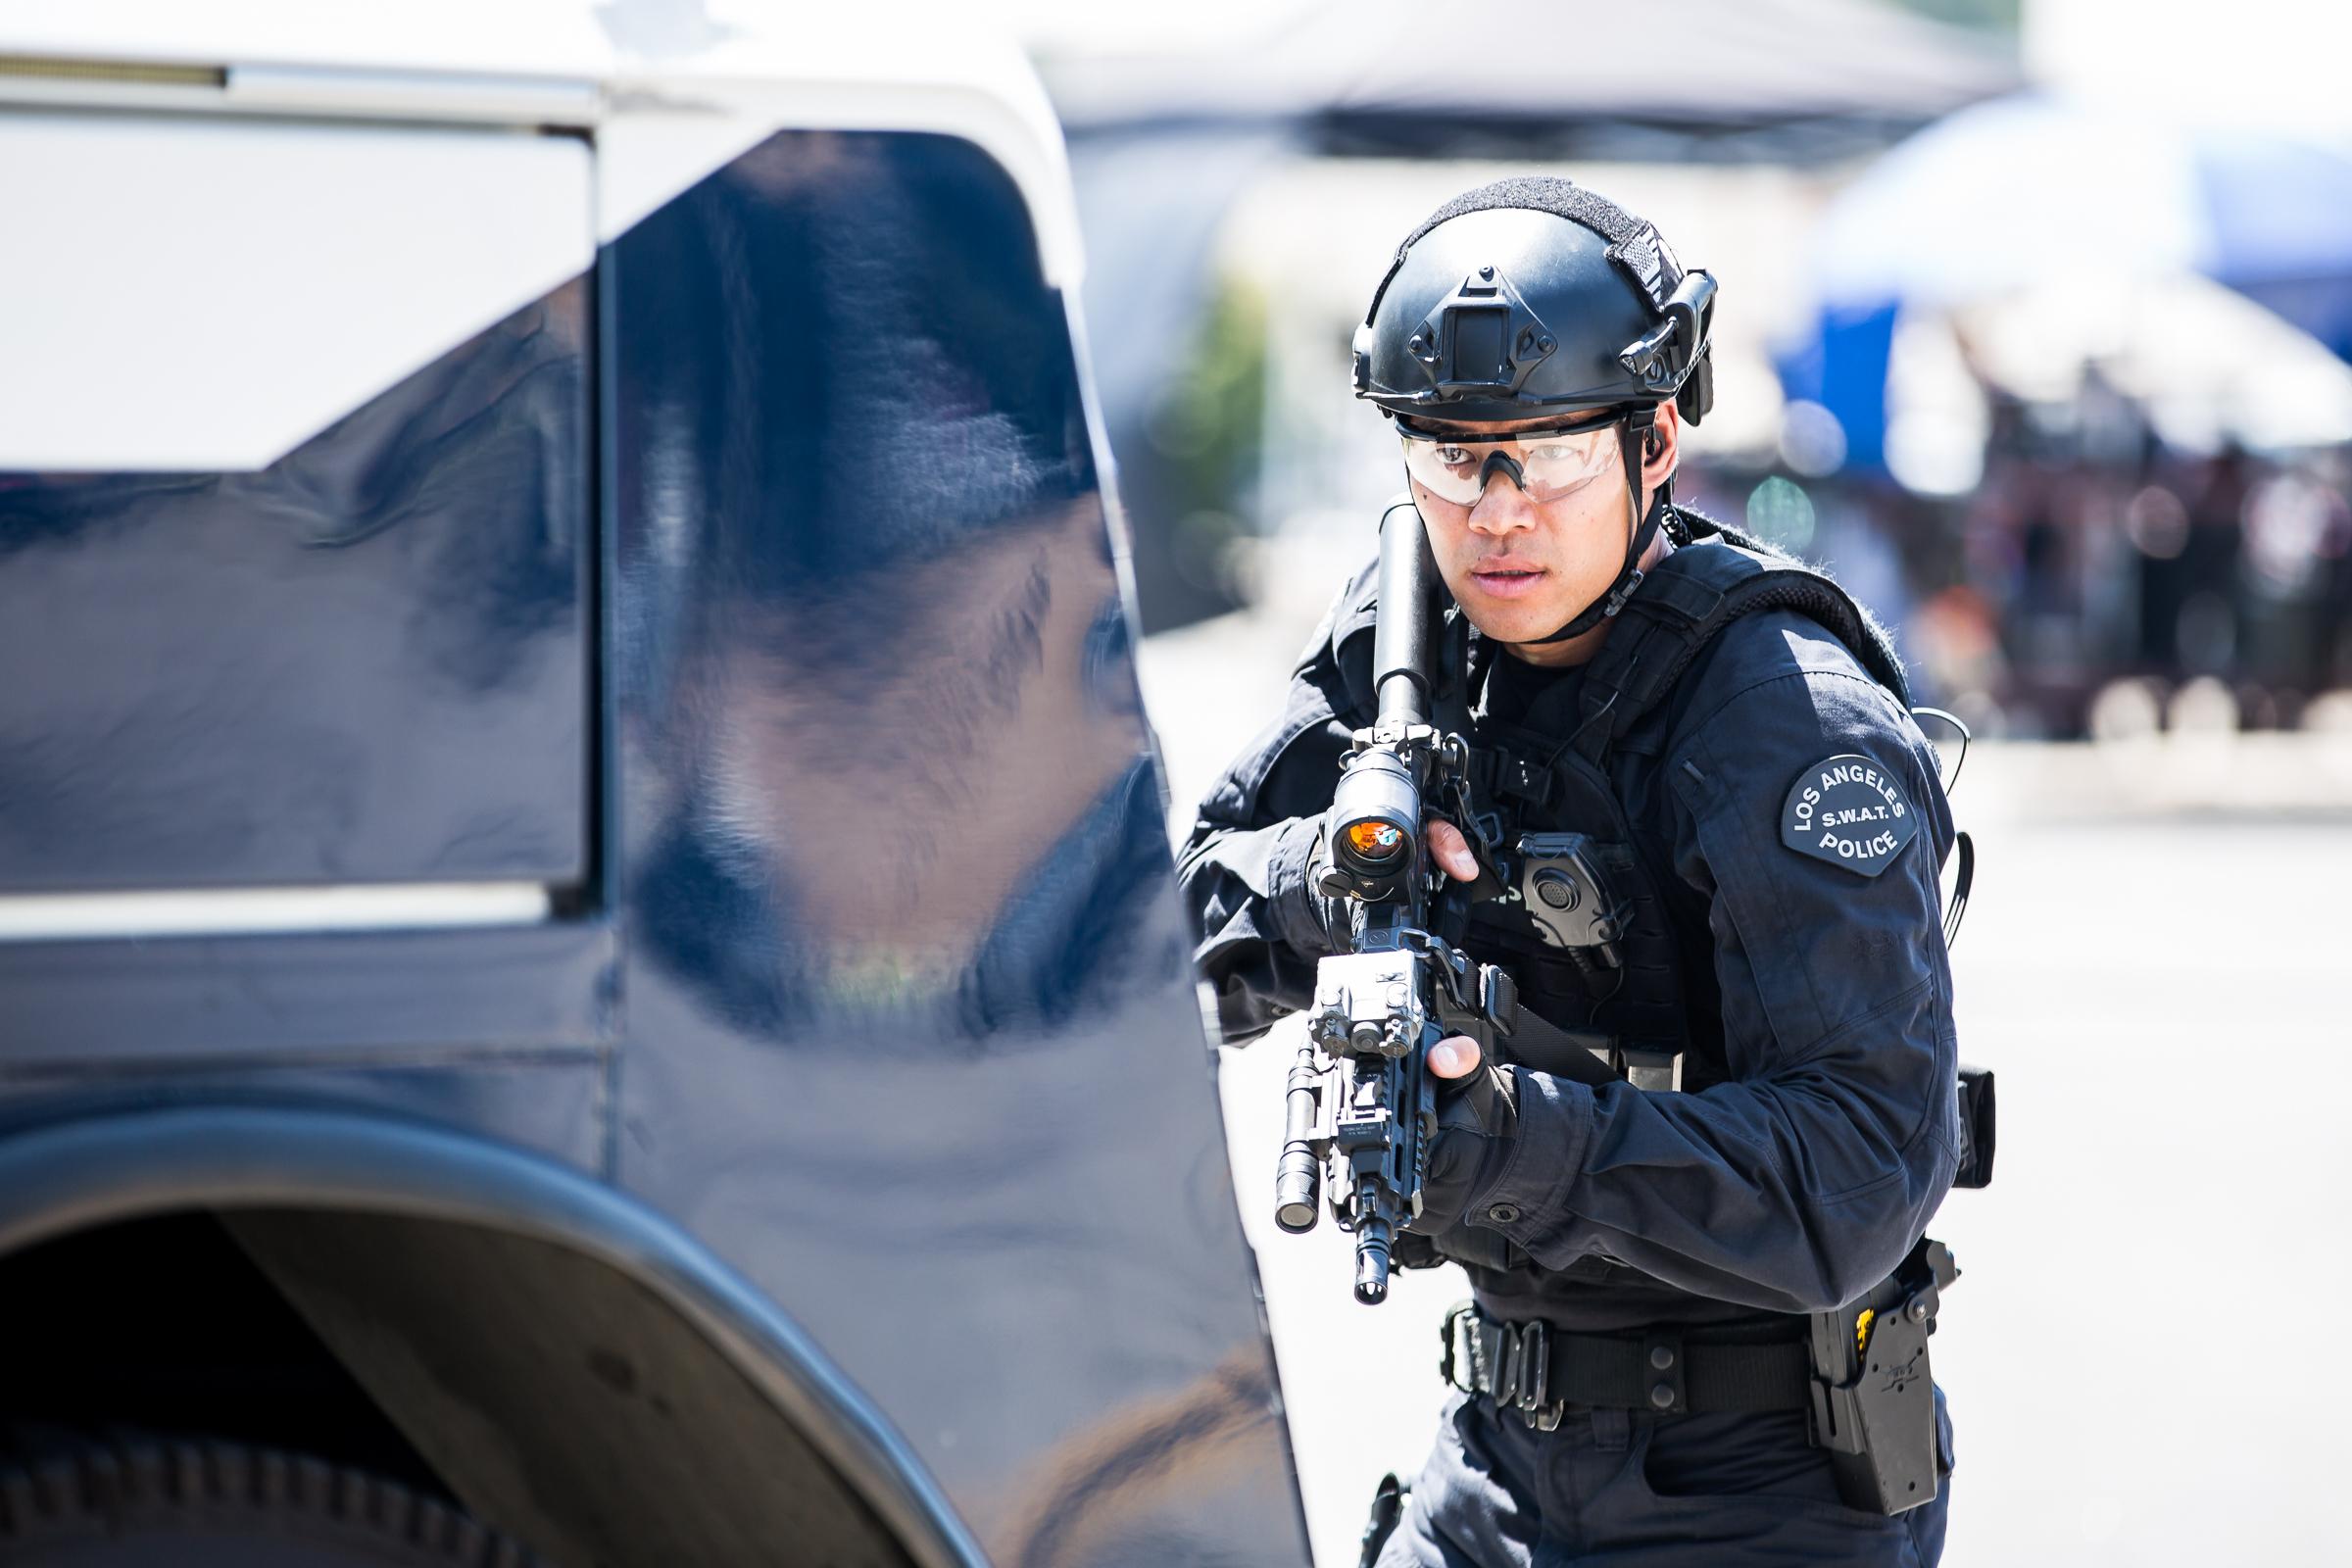 SWAT_EP204_DAVID-193.jpg